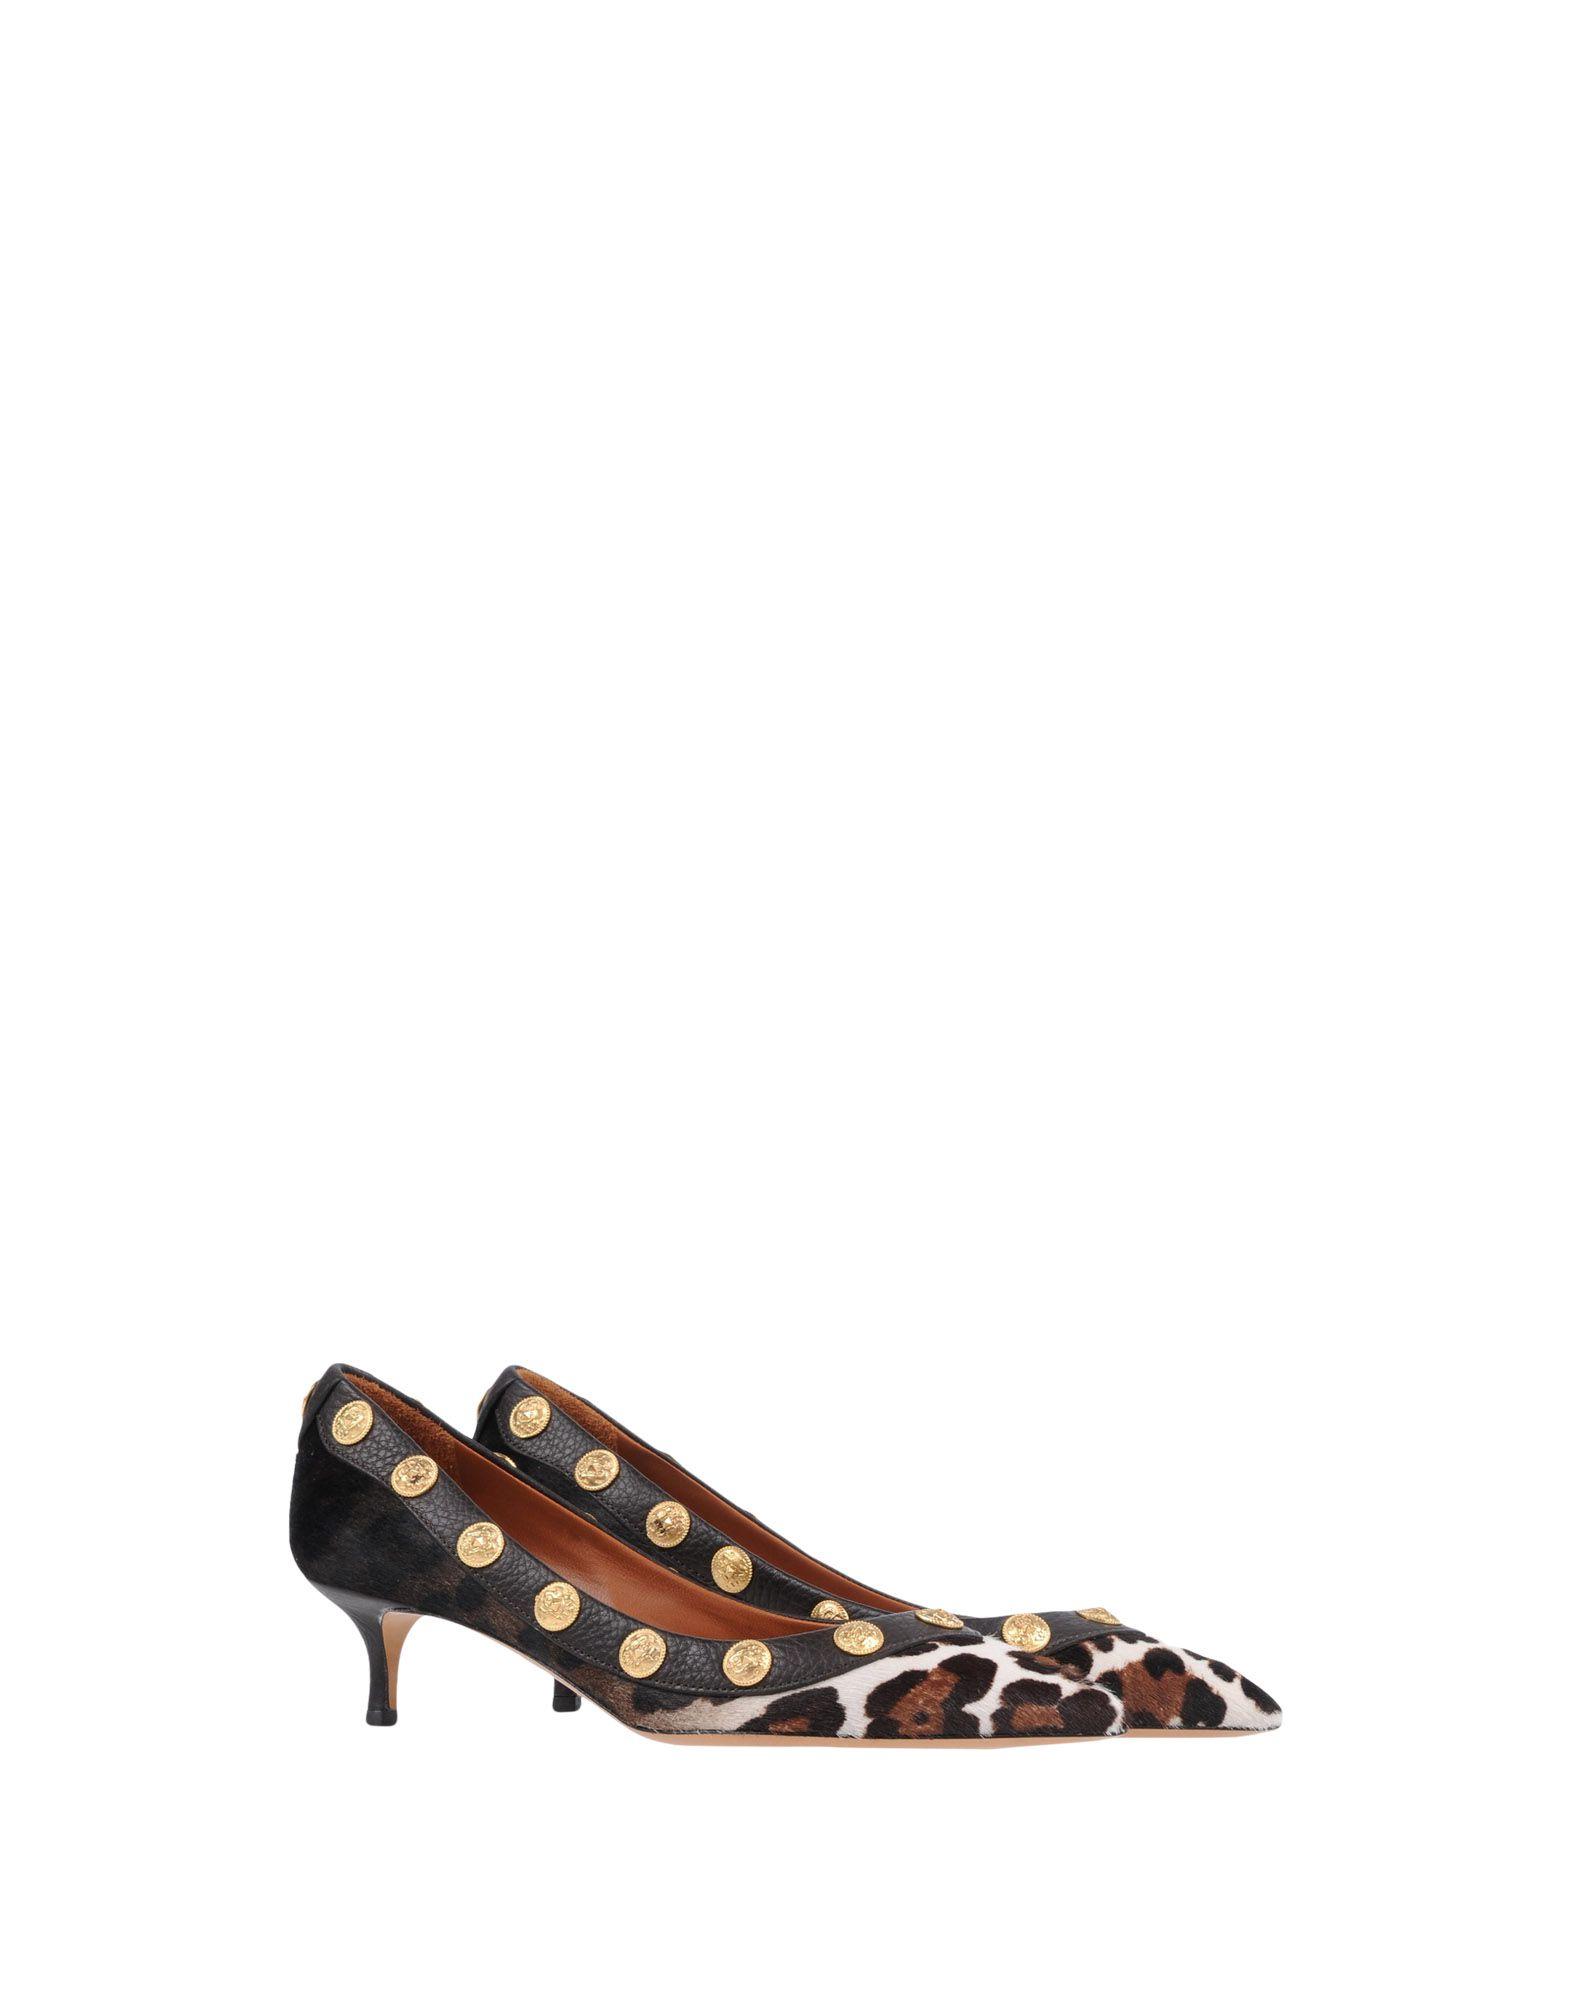 Valentino Garavani Pumps Damen  11446776VB Beliebte Schuhe Schuhe Schuhe 93c5c1